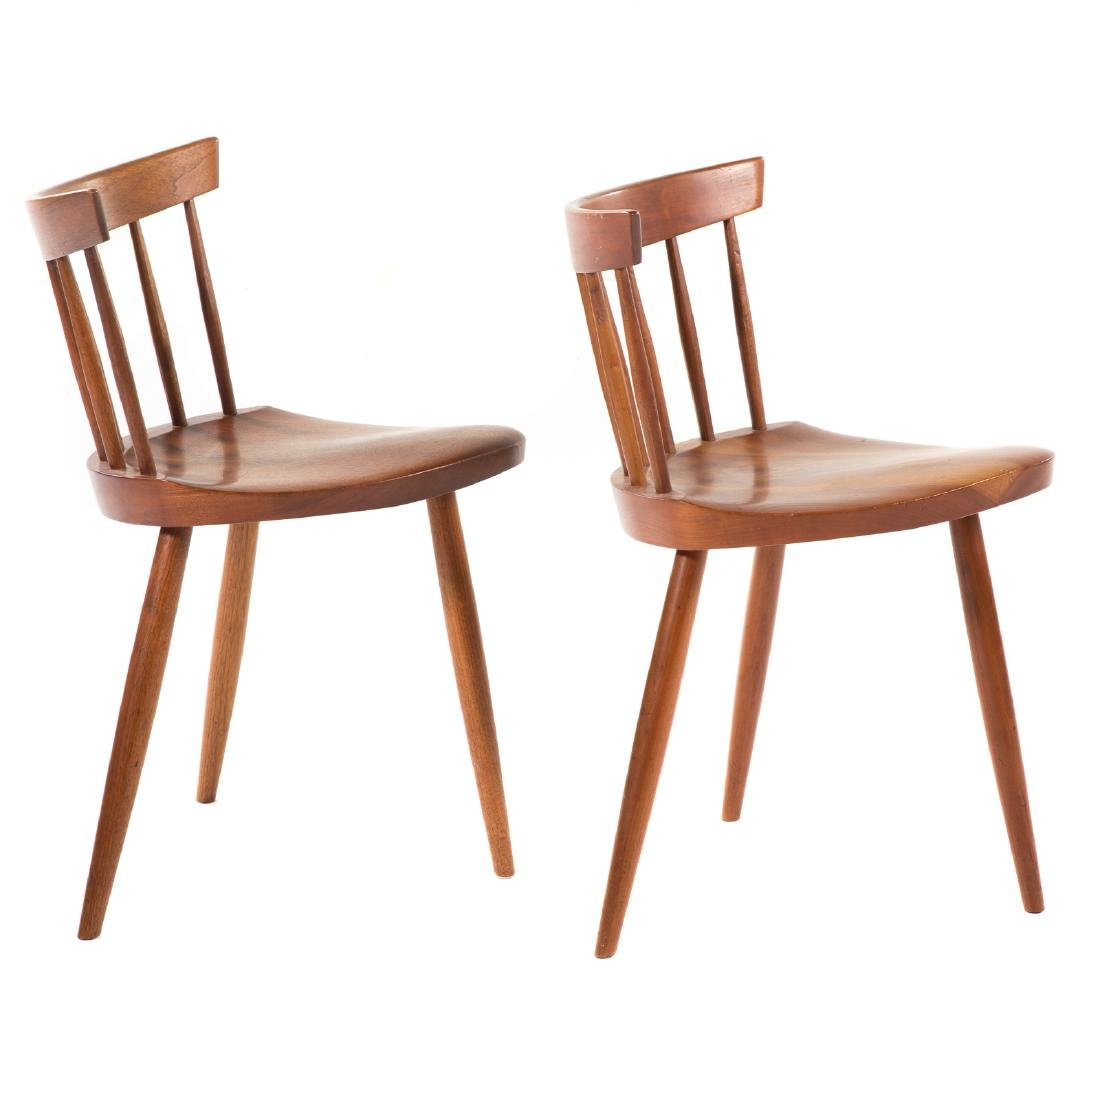 Two George Nakashima Mira Chairs - 2